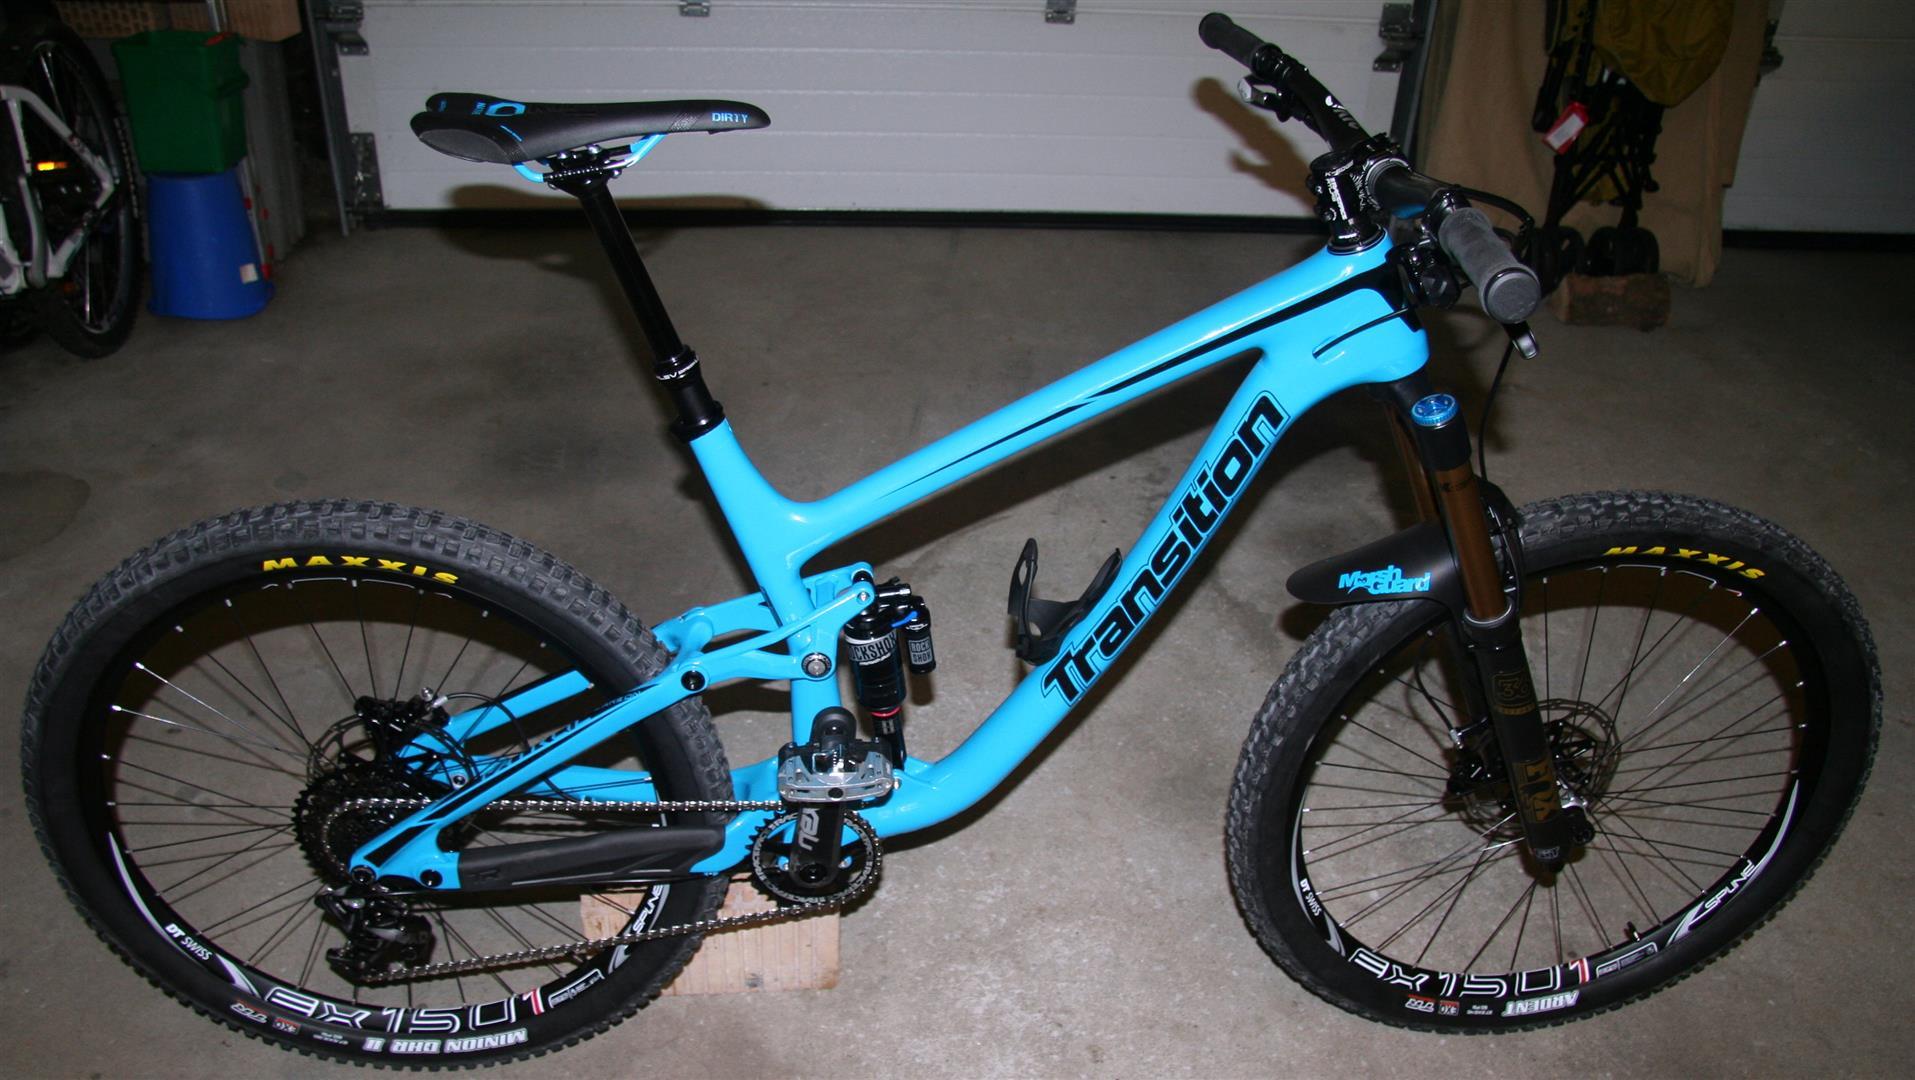 Drag Racing Helmets >> 2016 Transition Patrol Carbon - SOLD - mRwhite's Bike Check - Vital MTB